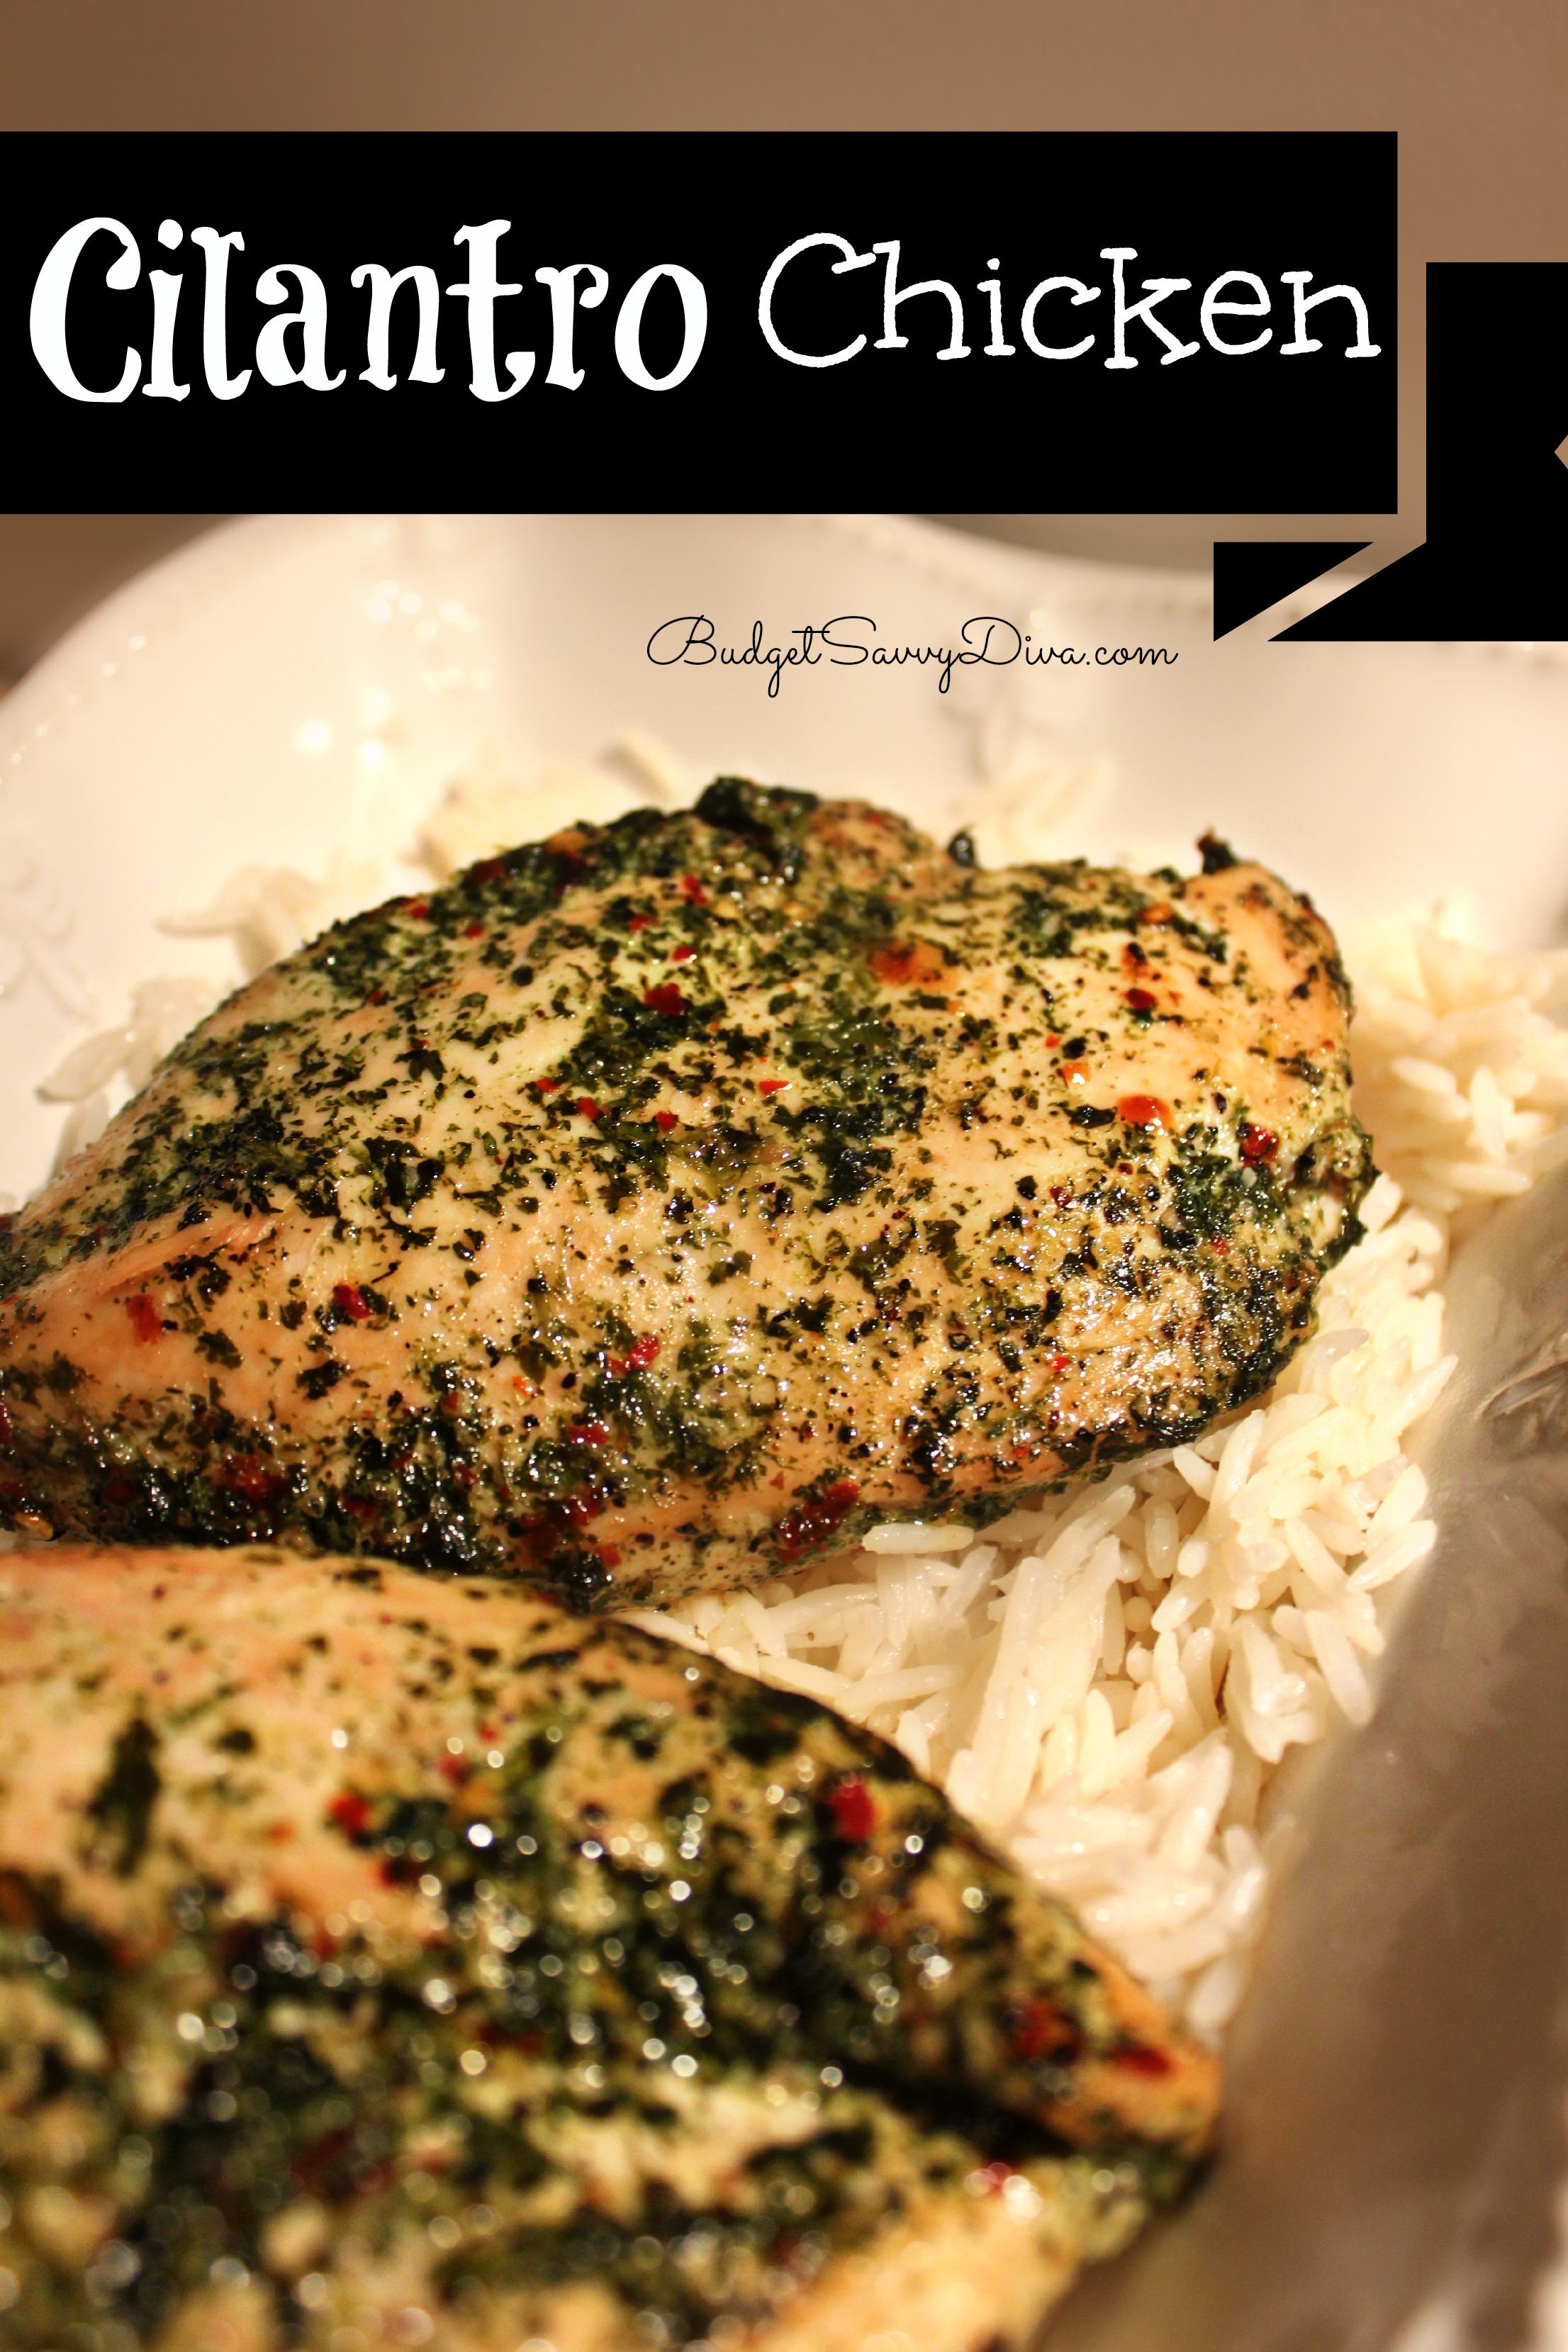 Cilantro Chicken Recipe | Budget Savvy Diva